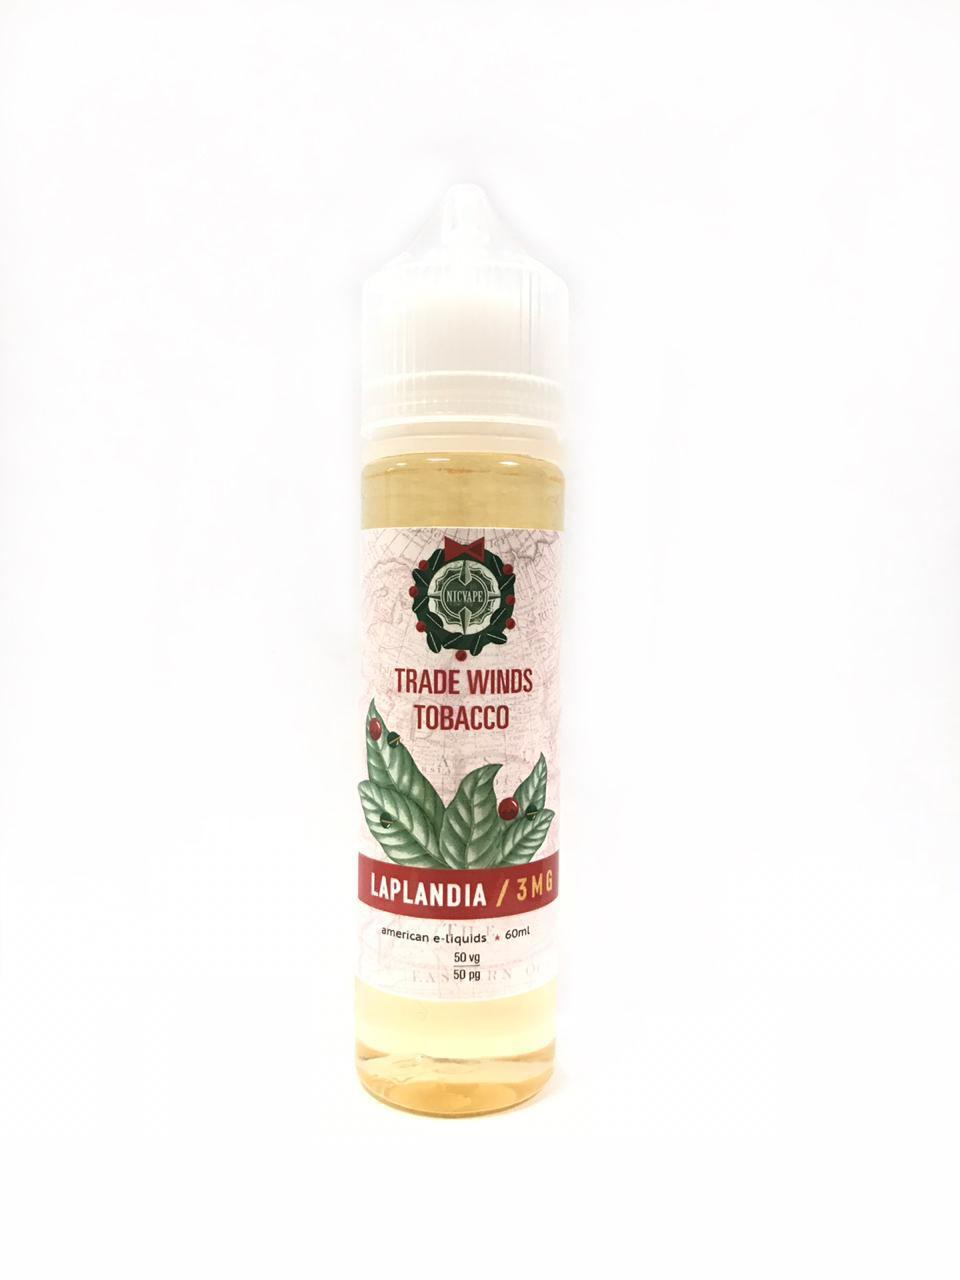 Tradewinds Tobacco Laplandia